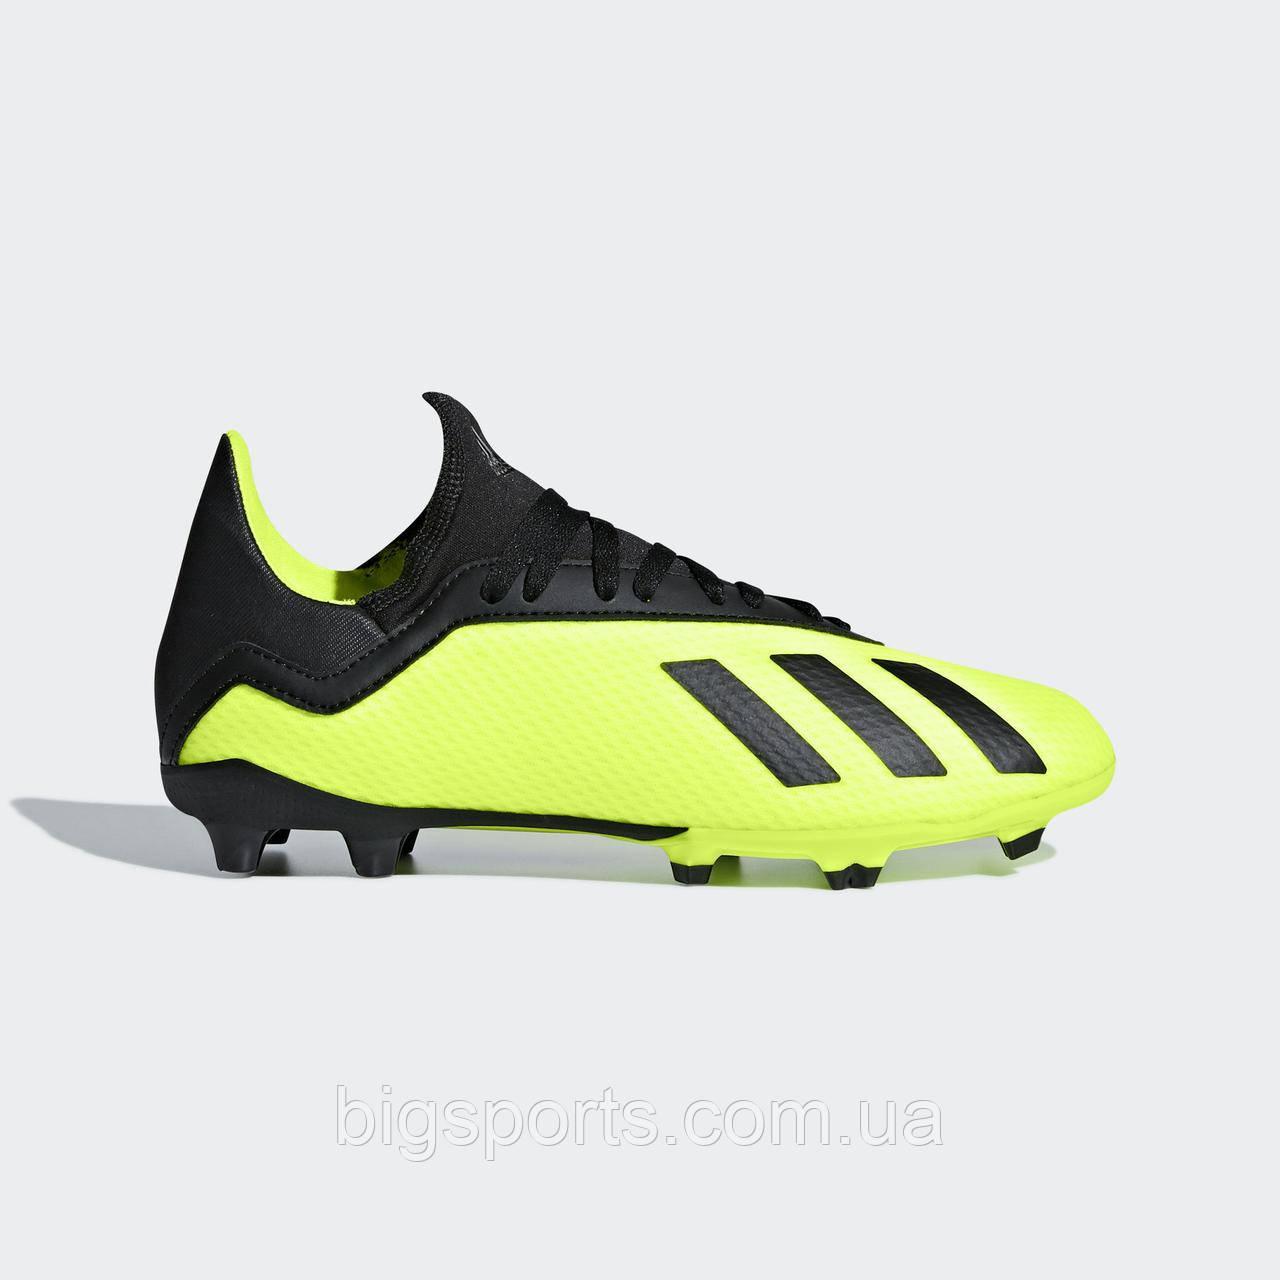 Бутси дет. Adidas Messi 15.3 FG (арт. S81494)